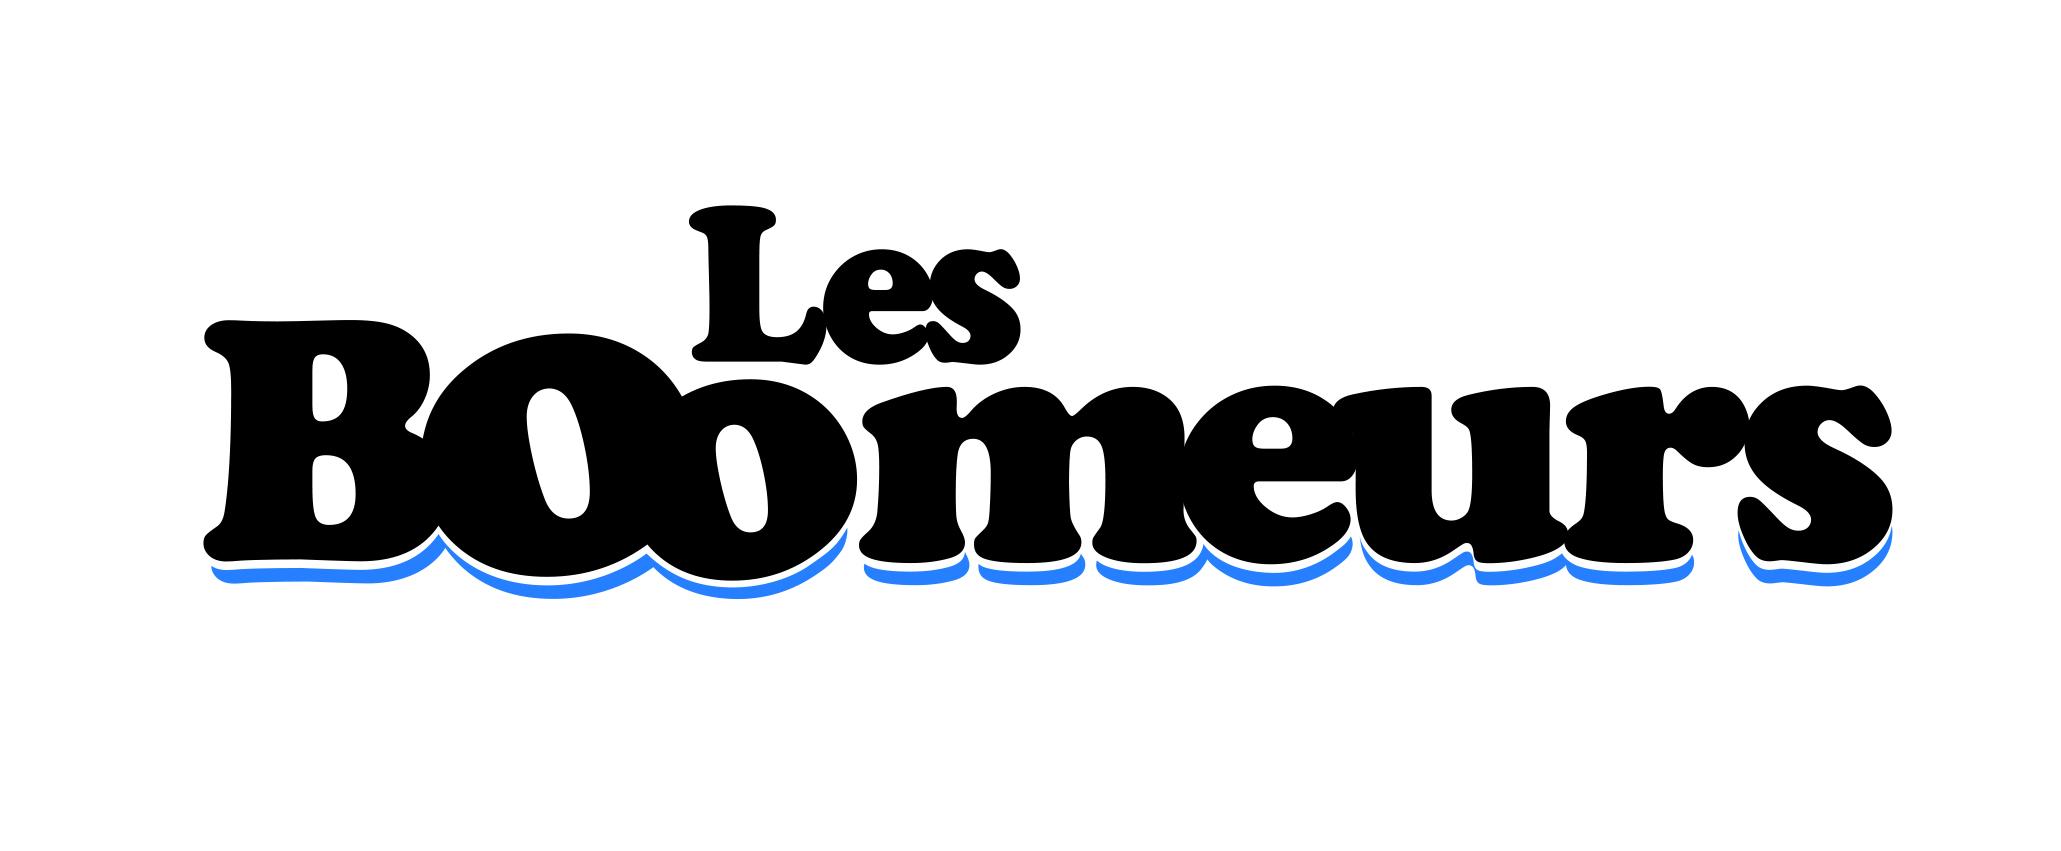 boomeurs - Les boomeurs, le webmagazine des quinquas